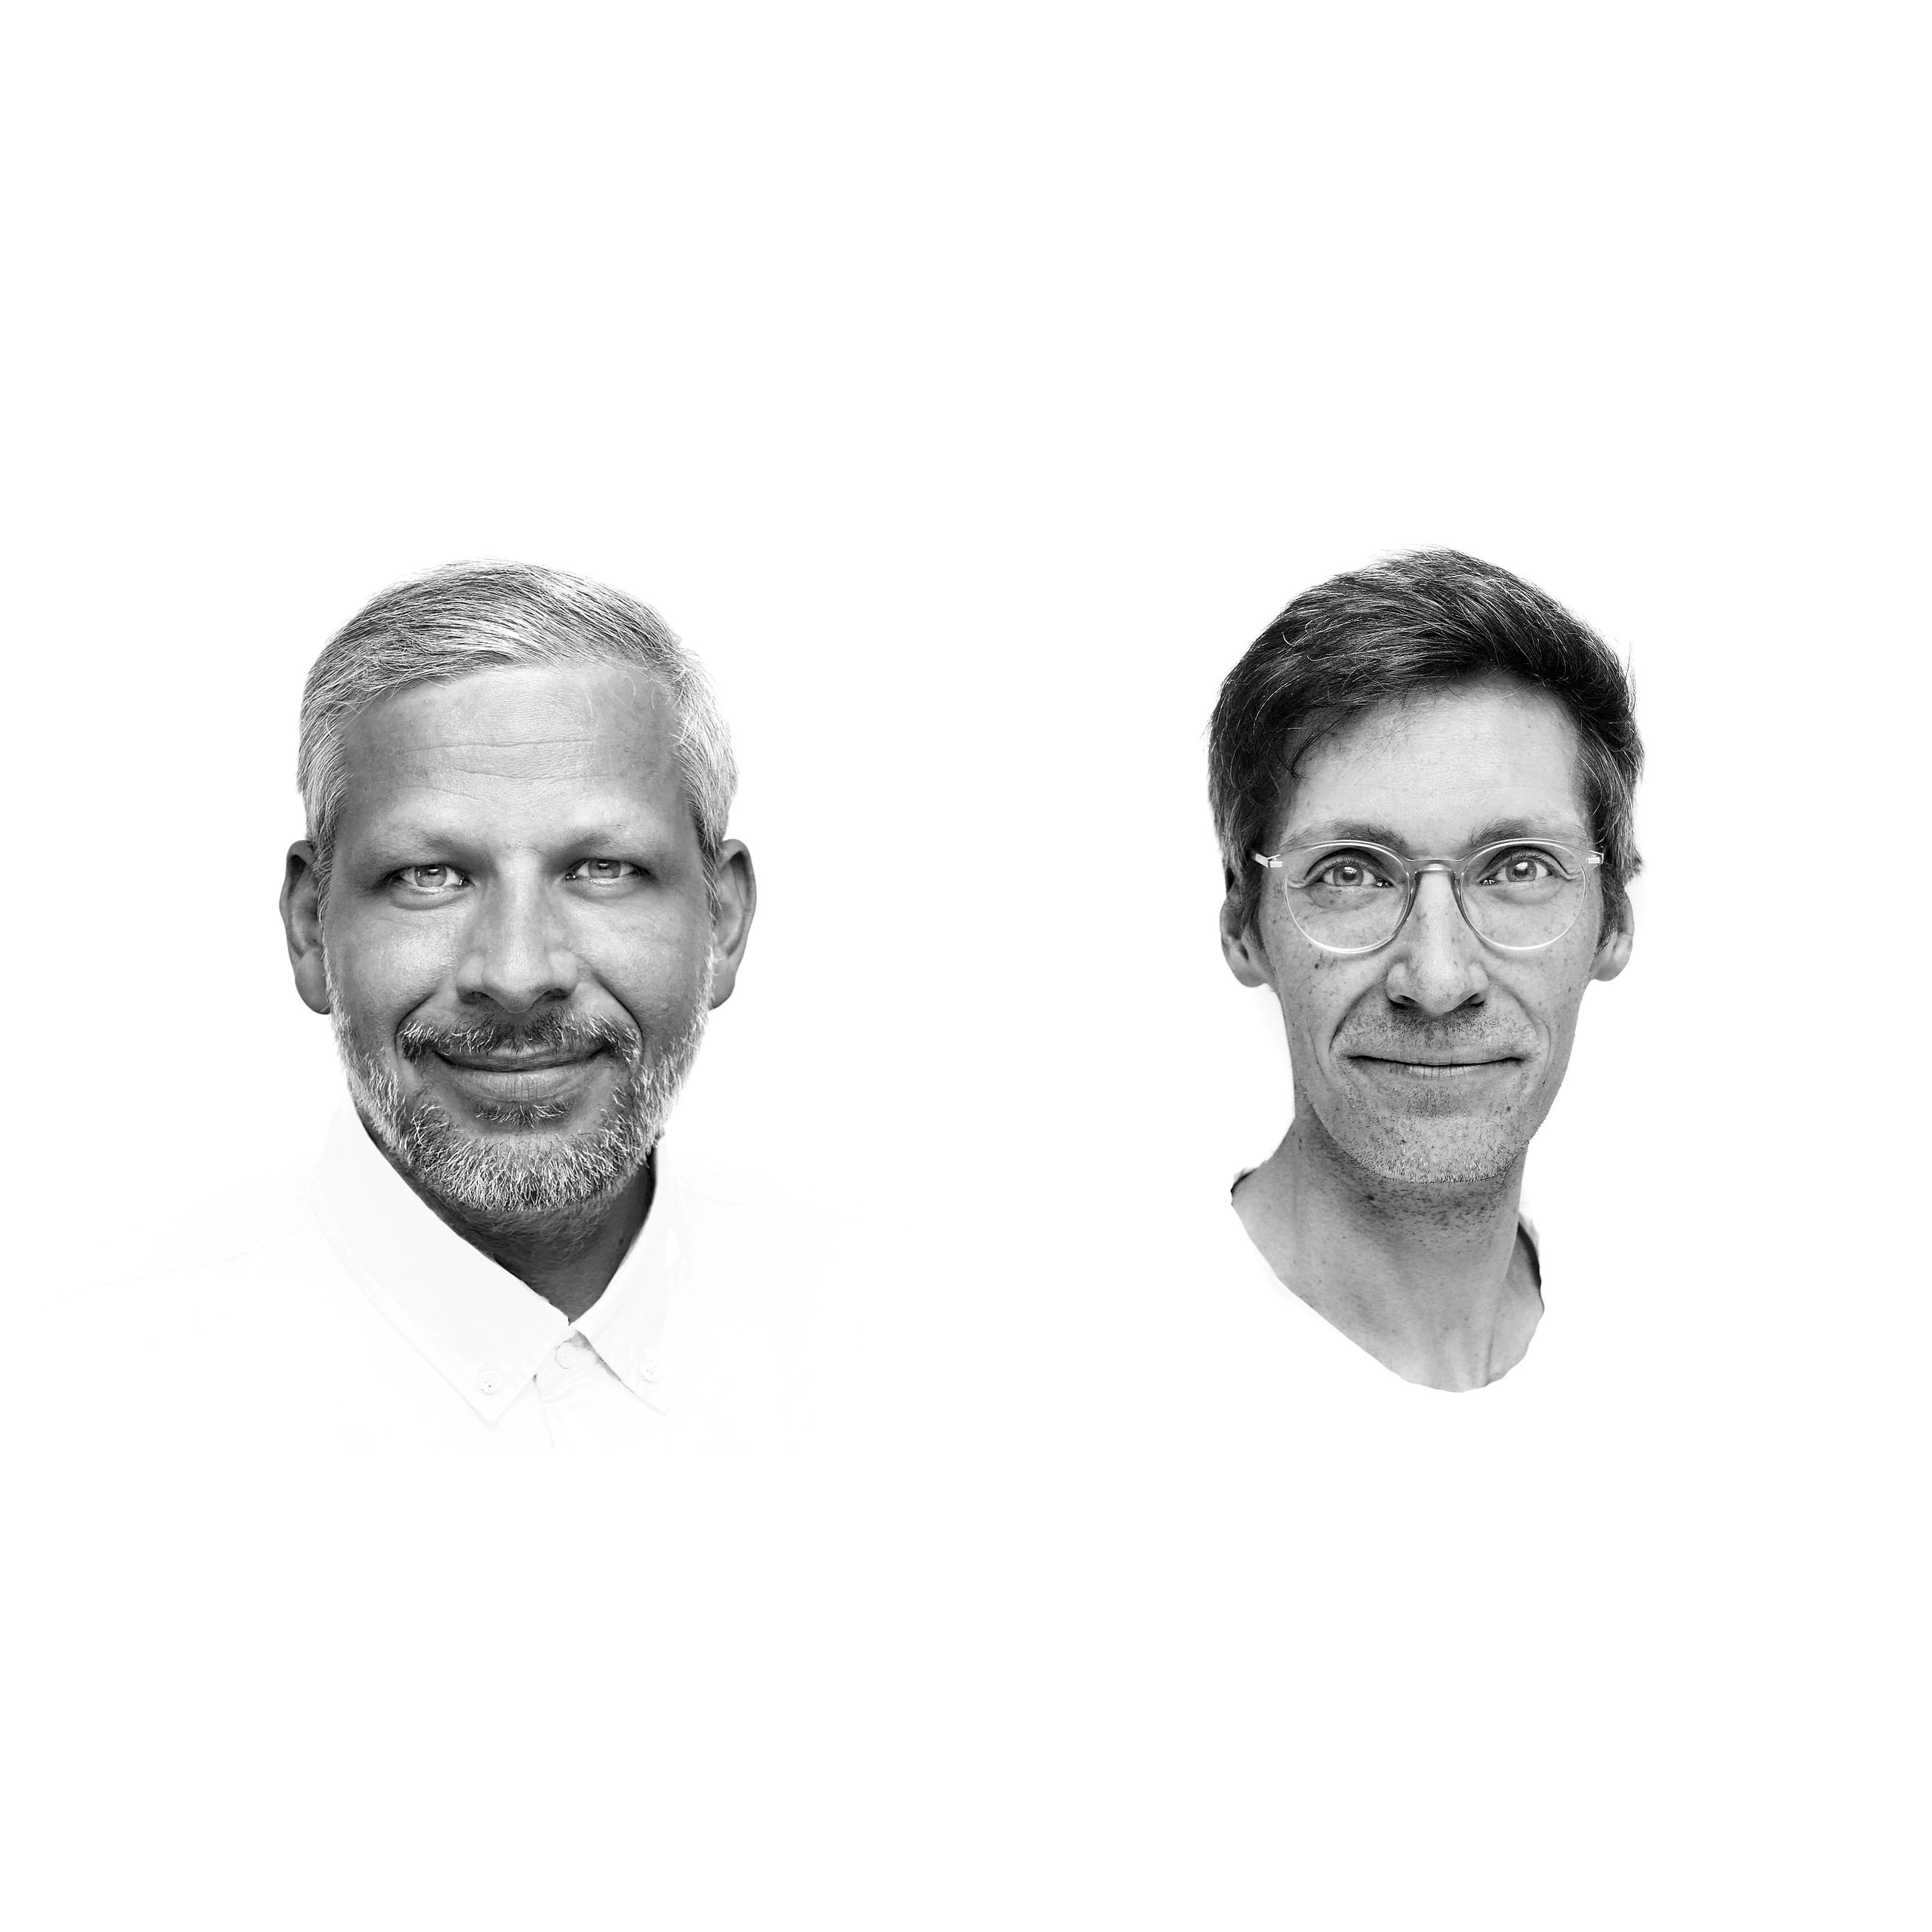 Manuel Casasola Merkle & Moritz Schwind